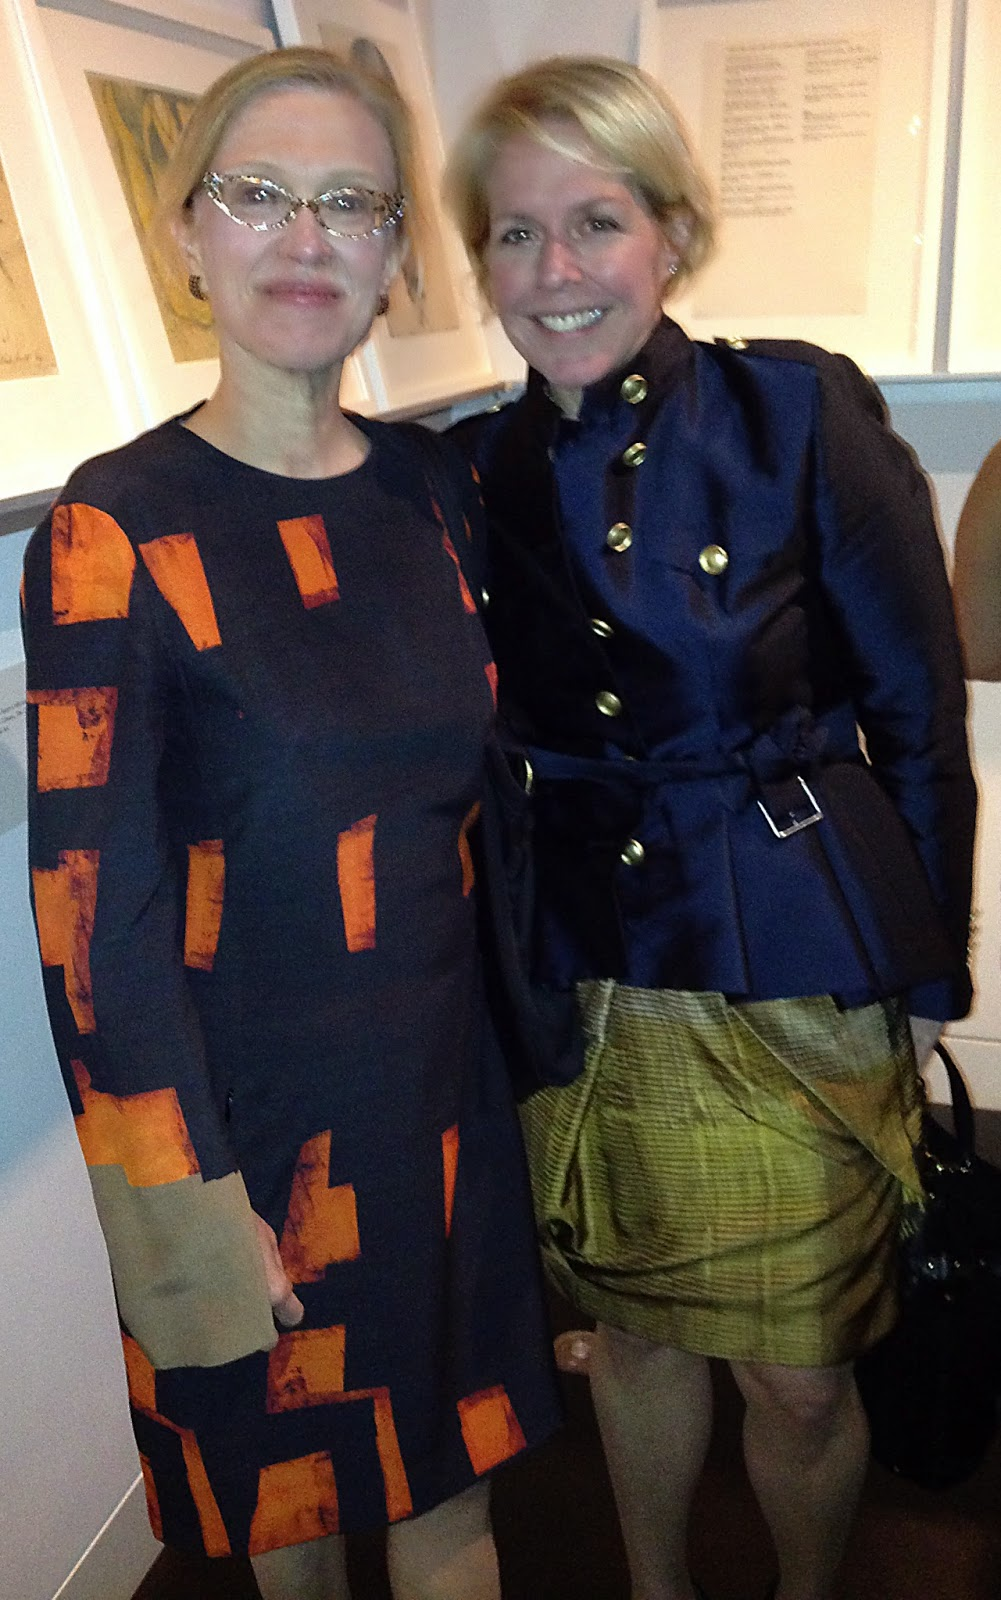 idiosyncratic fashionistas charles james beyond fashion idiosyncratic fashionistas